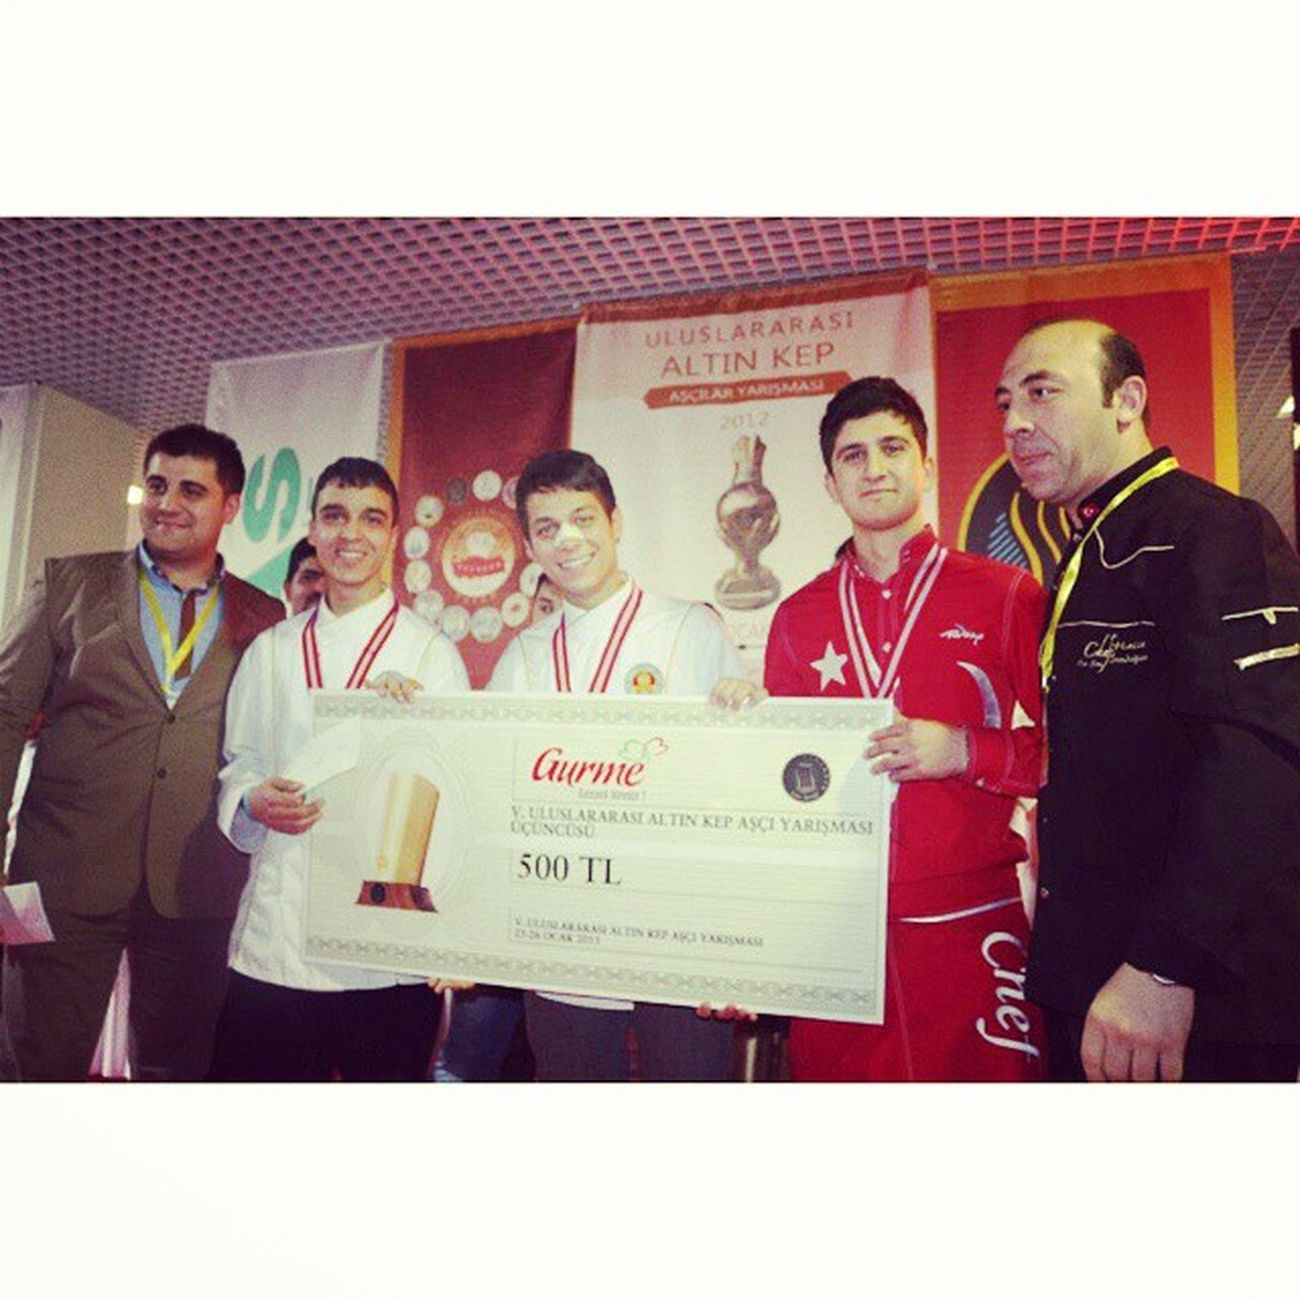 Antalya Altin Golden Cap kep 500tl awards Happy chefs my team: )